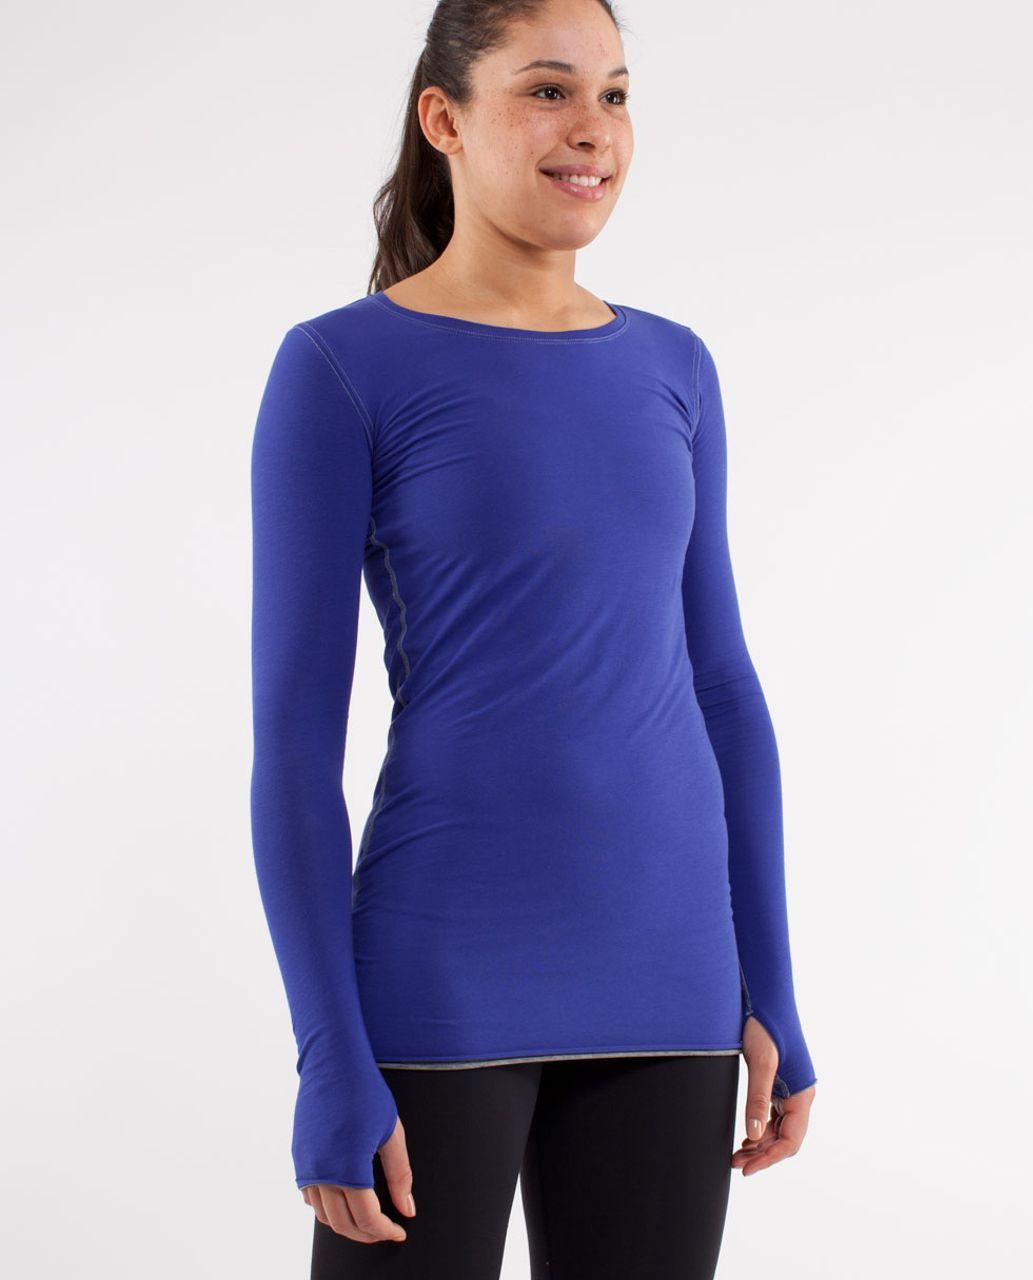 Lululemon Cabin Long Sleeve Tee II - Pigment Blue /  Heathered Blurred Grey